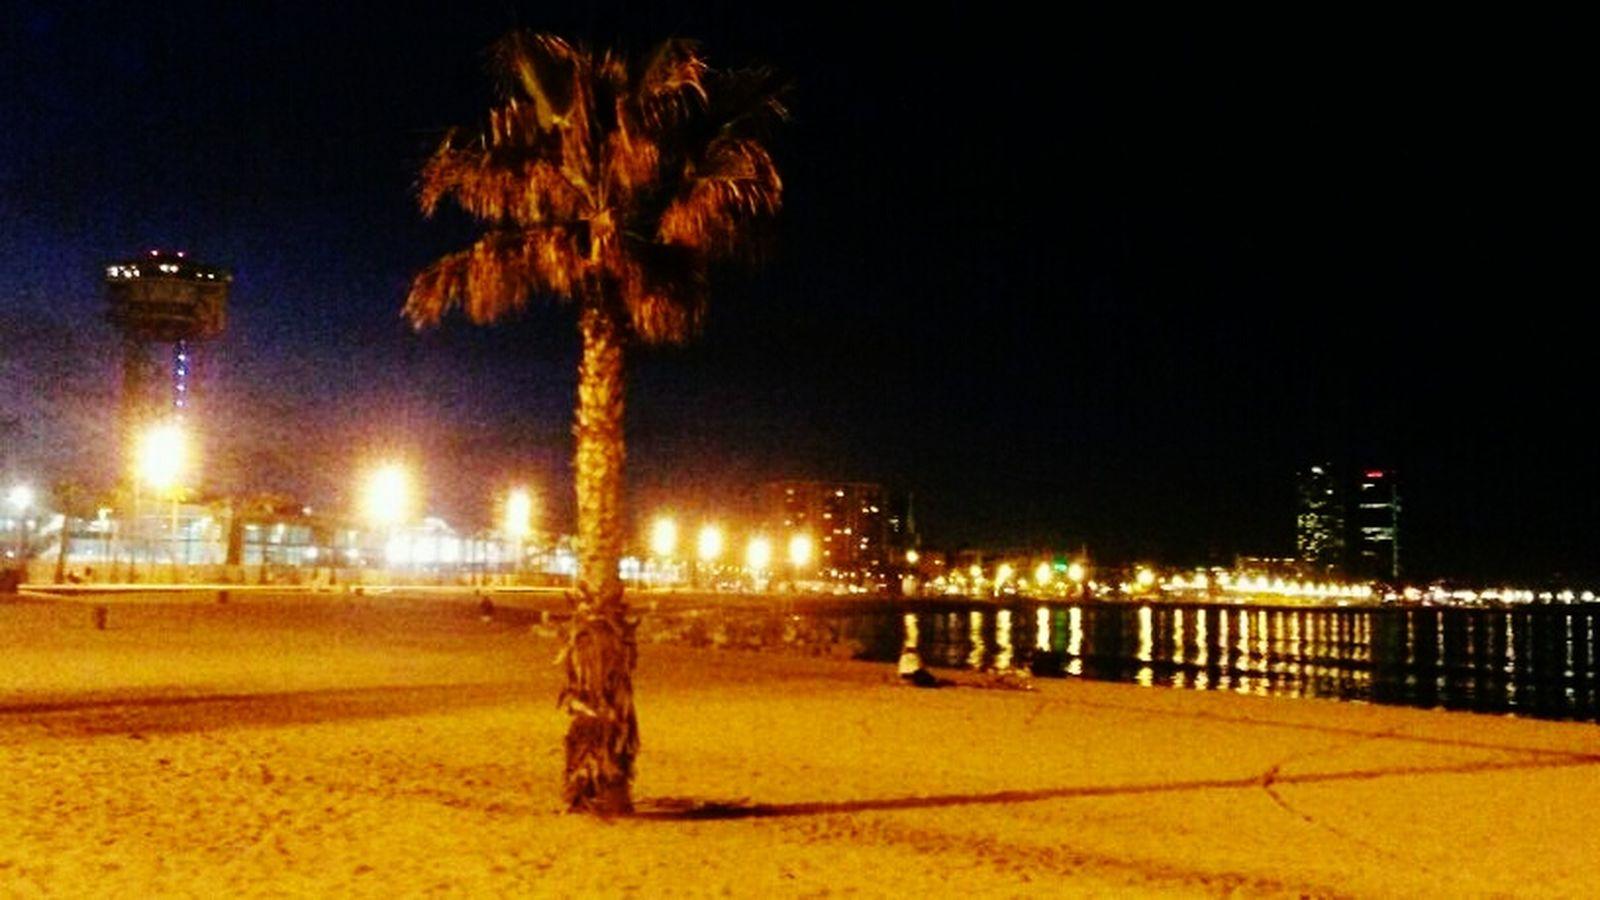 Urban Escape Oasis Urbanphotography Urban Oasis Barcelona♡♥♡♥♡ Barcelonalove Barceloneta Palm Trees My Running View Thebcnpost